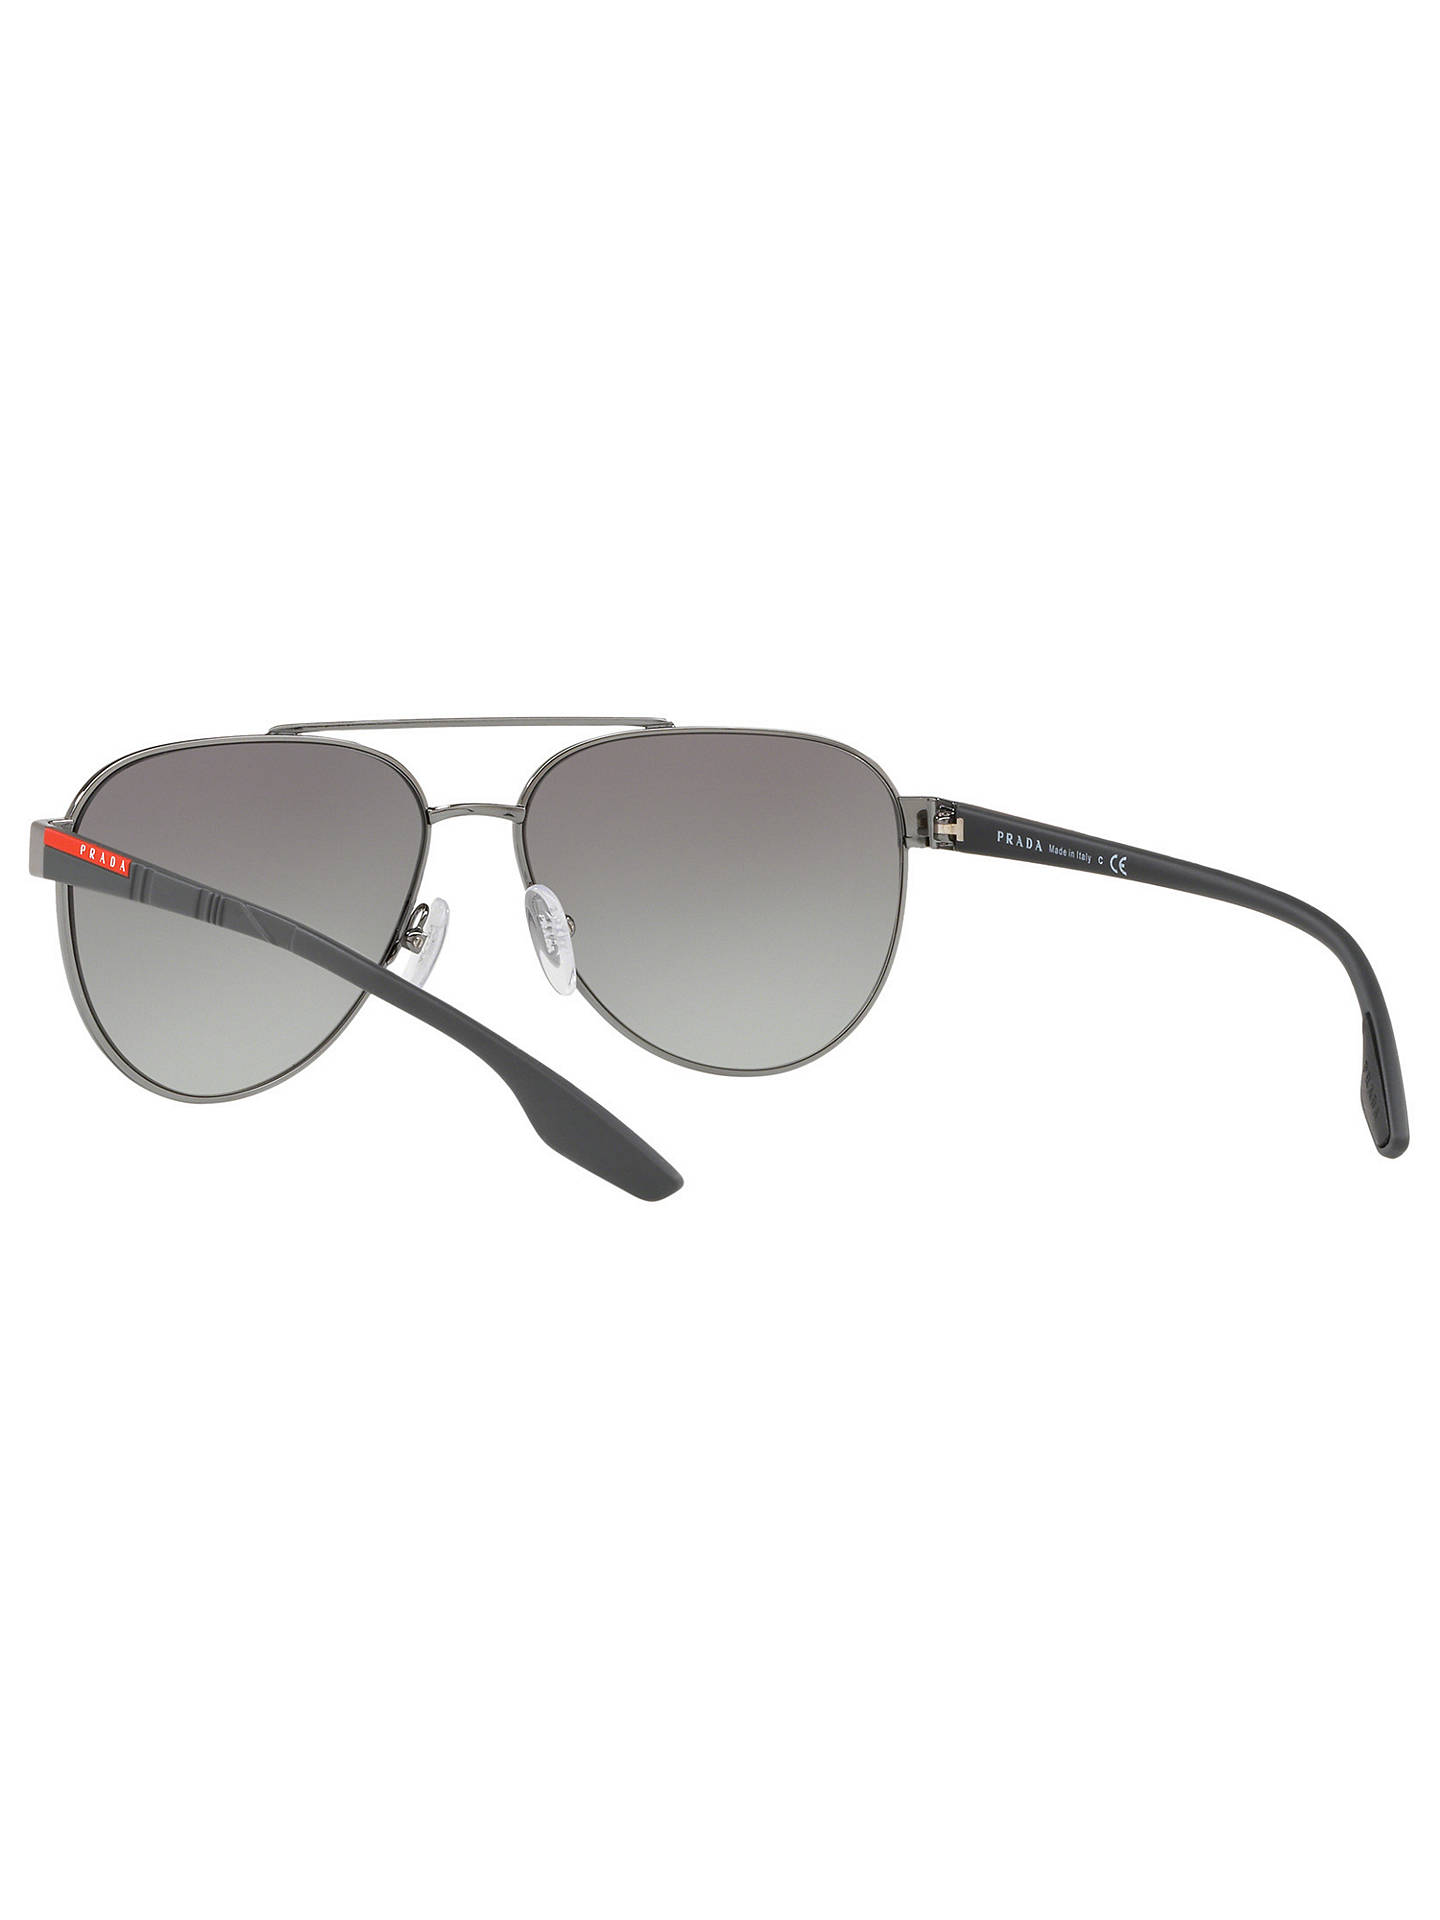 2eeb9429131 ... Buy Prada Linea Rossa PS 54TS Men s Aviator Sunglasses